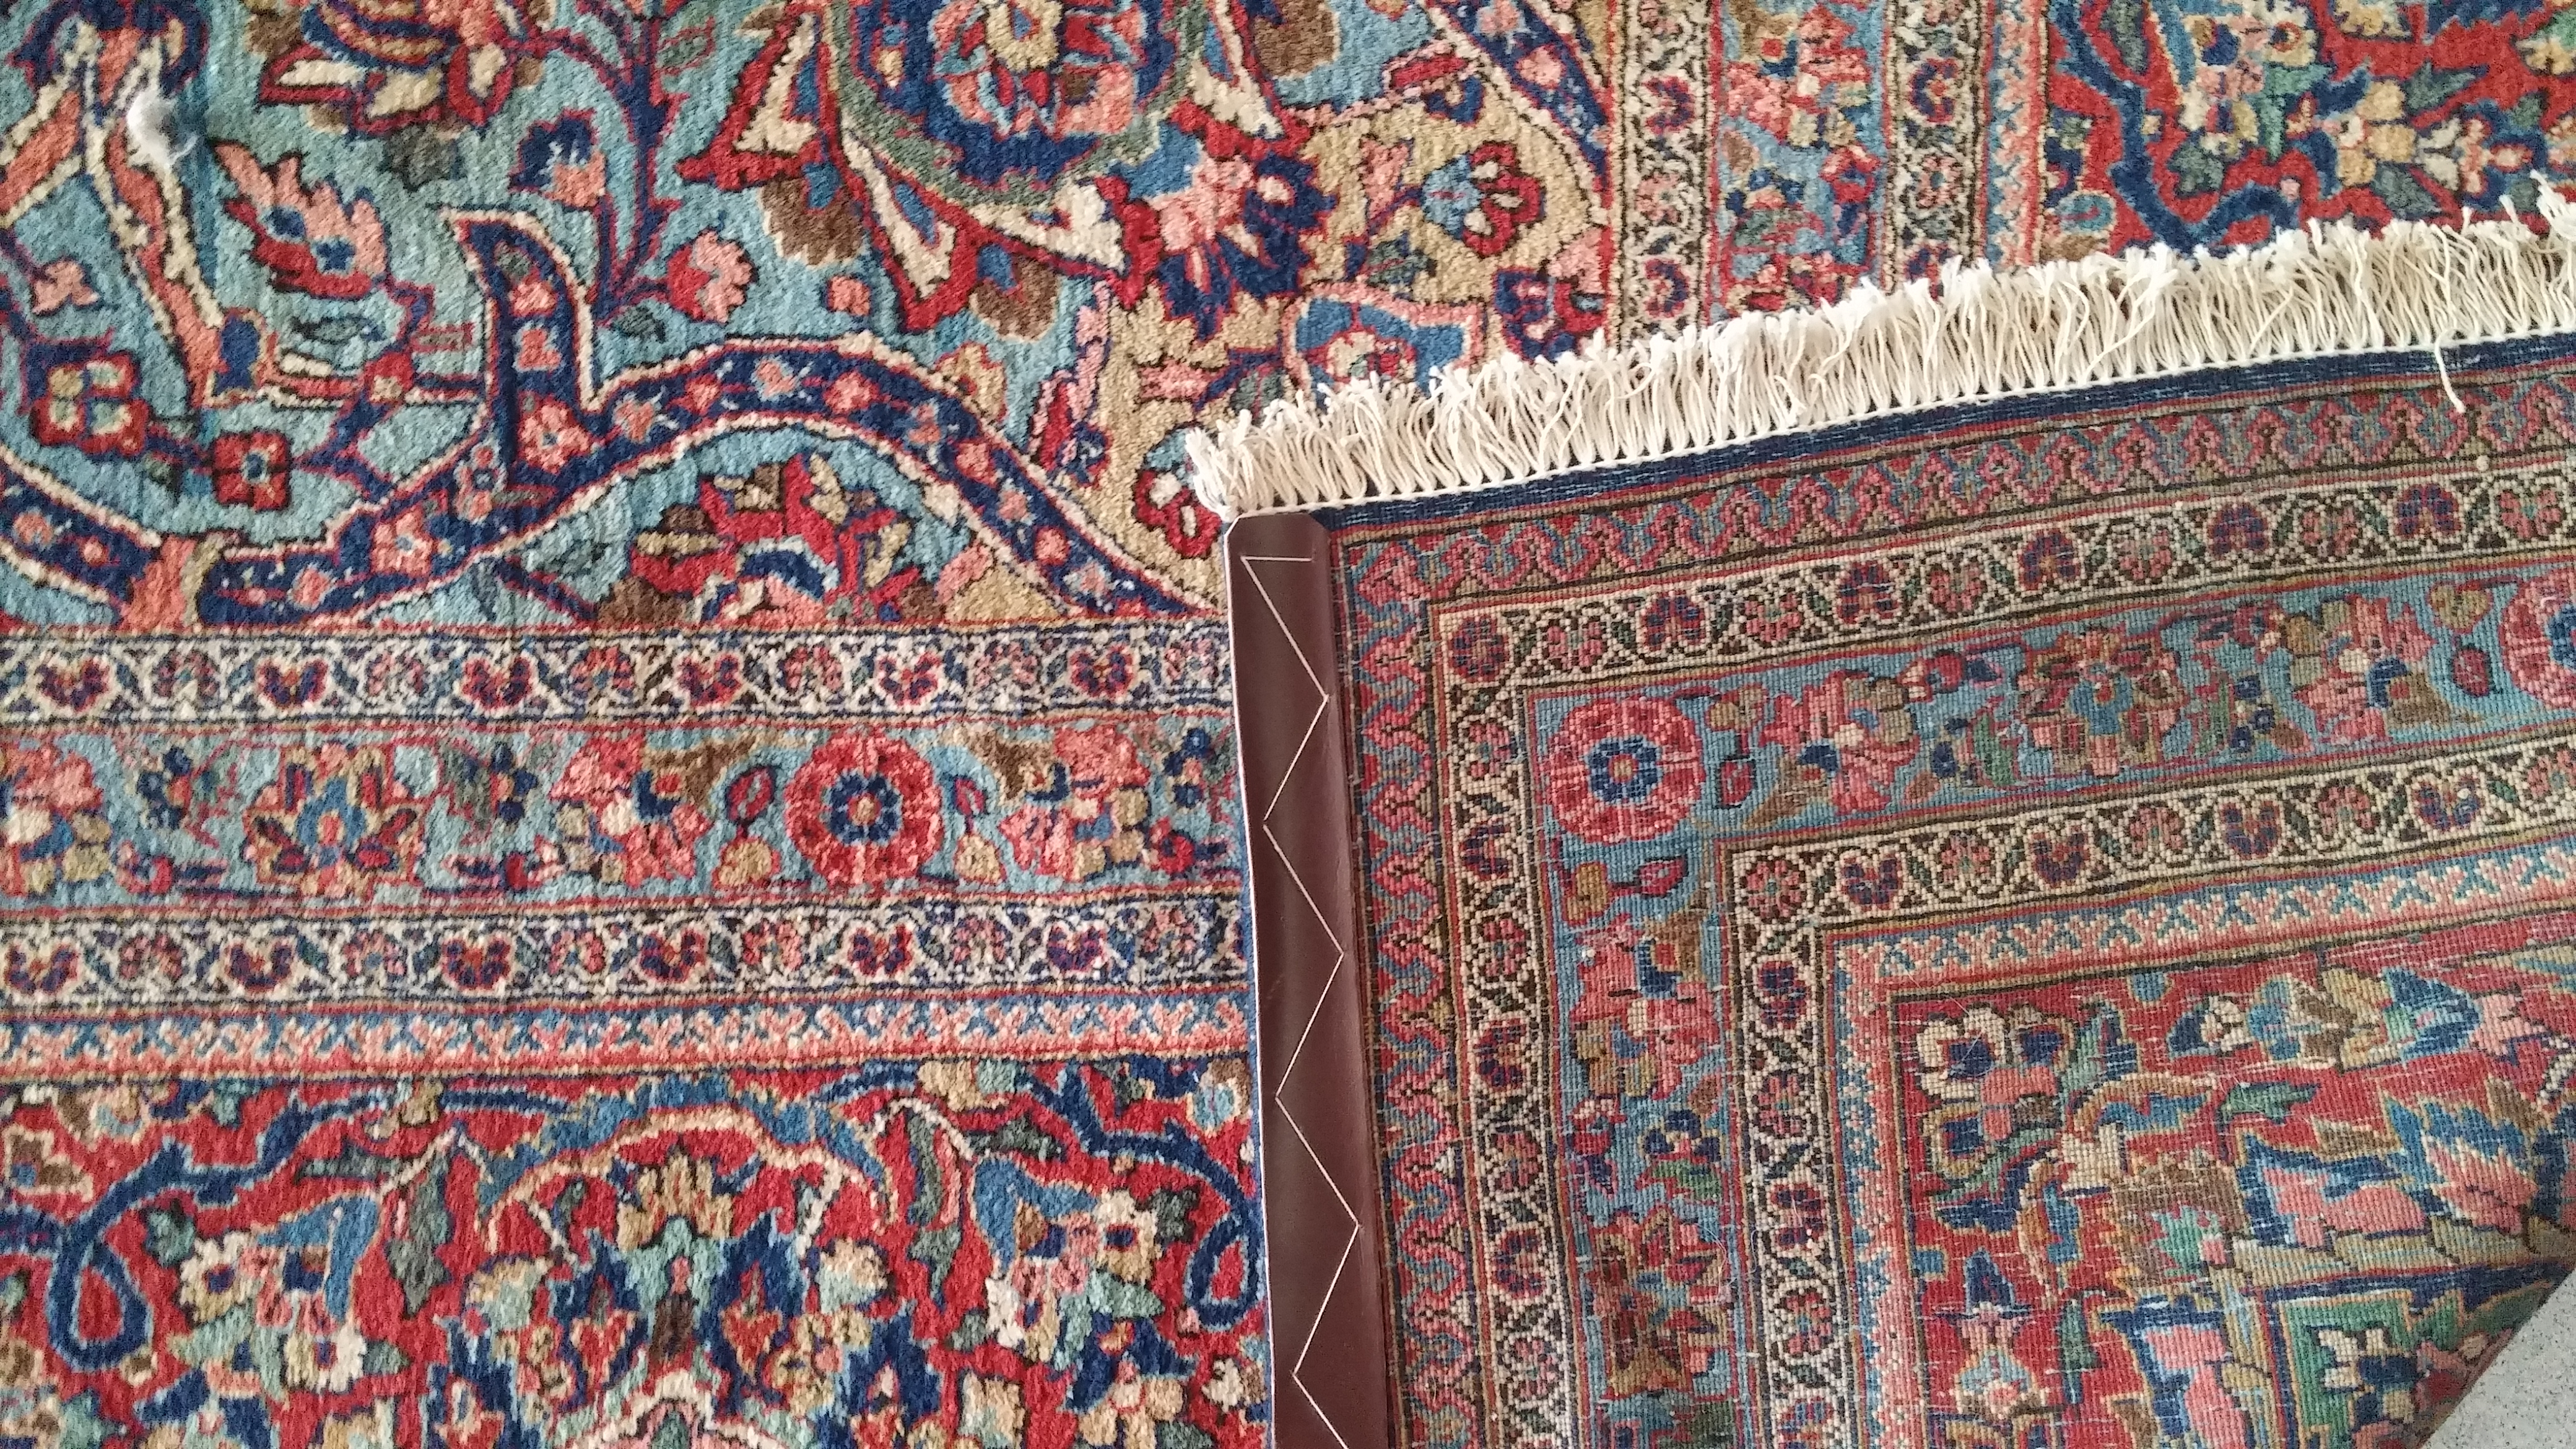 tapis design montreal interesting arya tapis accessoires opening hours boulevard le corbusier